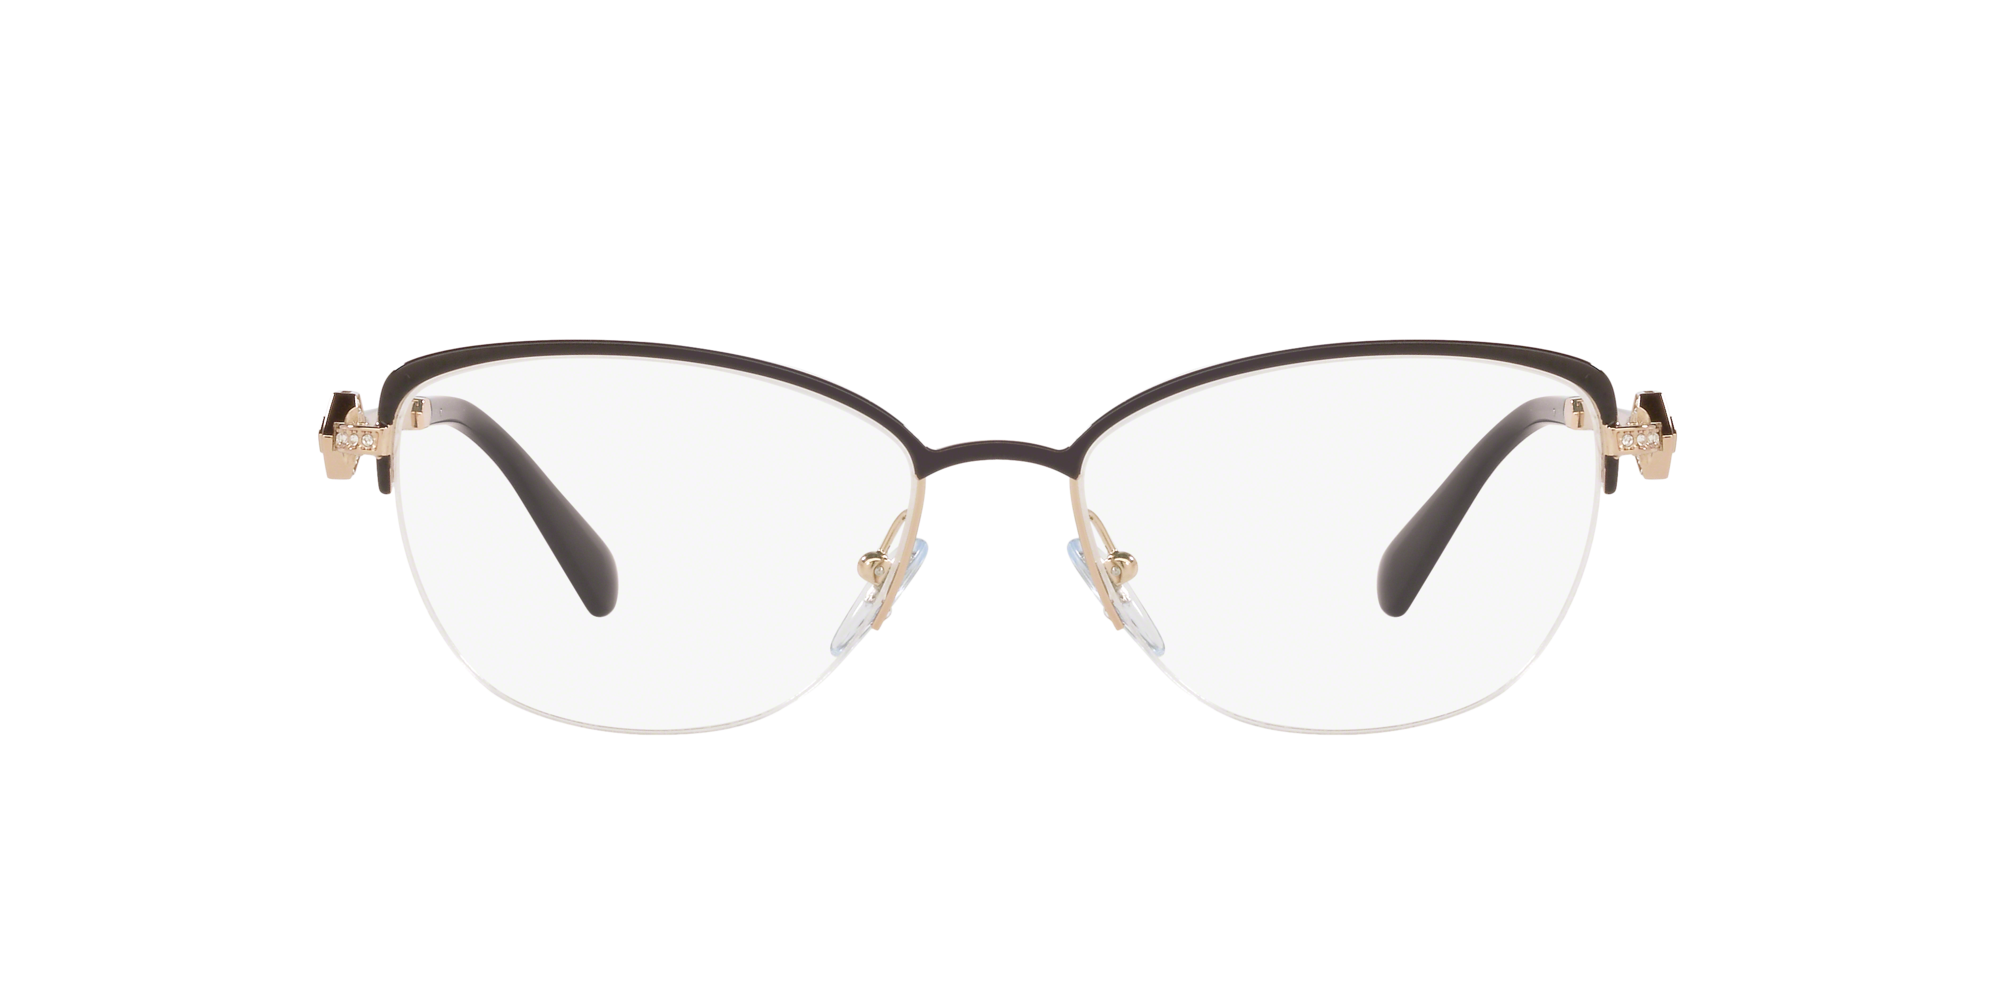 Image for BV2210B from LensCrafters | Glasses, Prescription Glasses Online, Eyewear